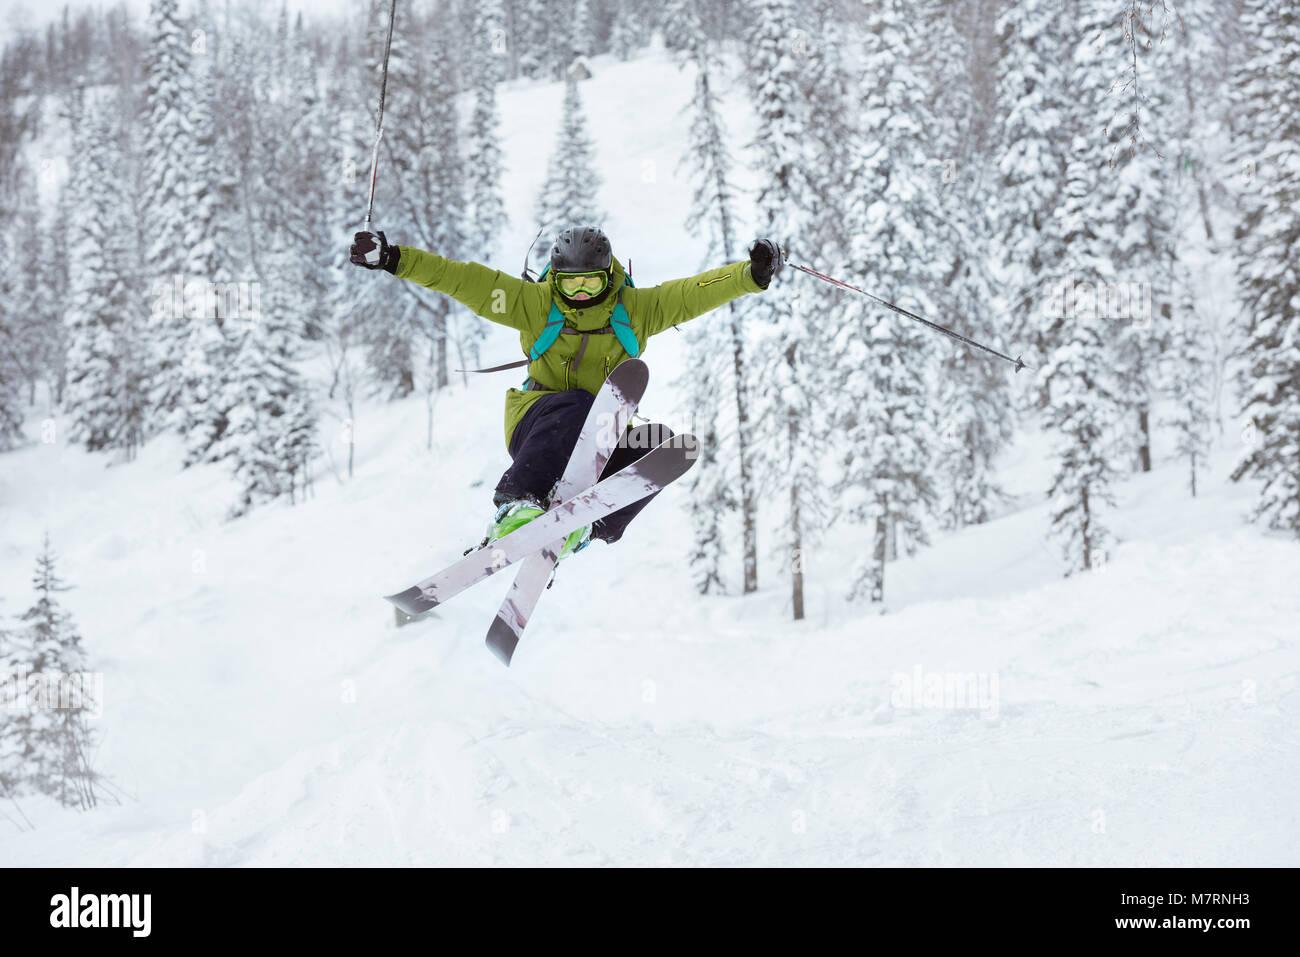 Skier jumps offpiste ski slope resort - Stock Image